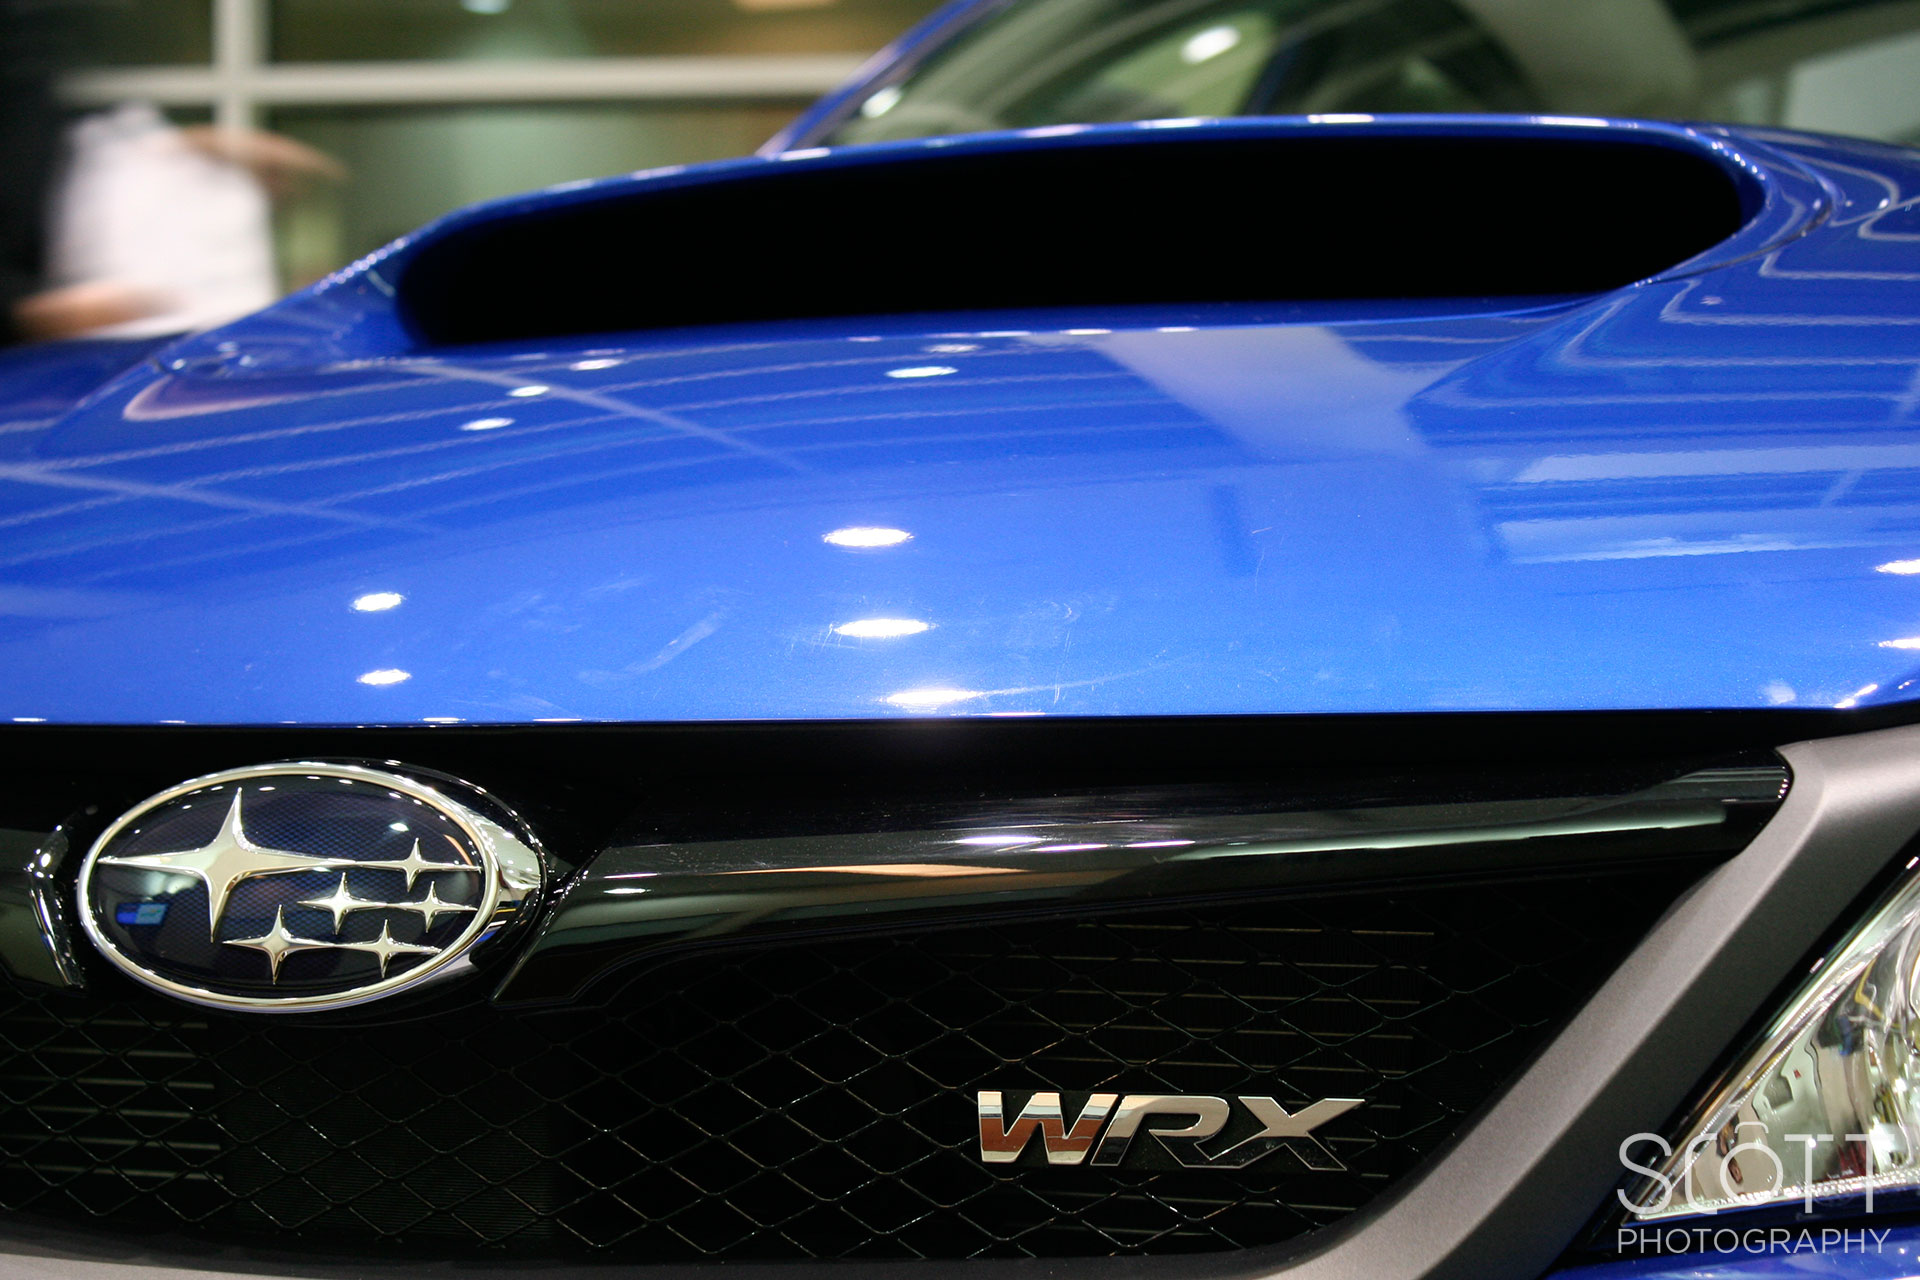 2014 Subaru Wrx Logo Badge Scott Sousa Photography